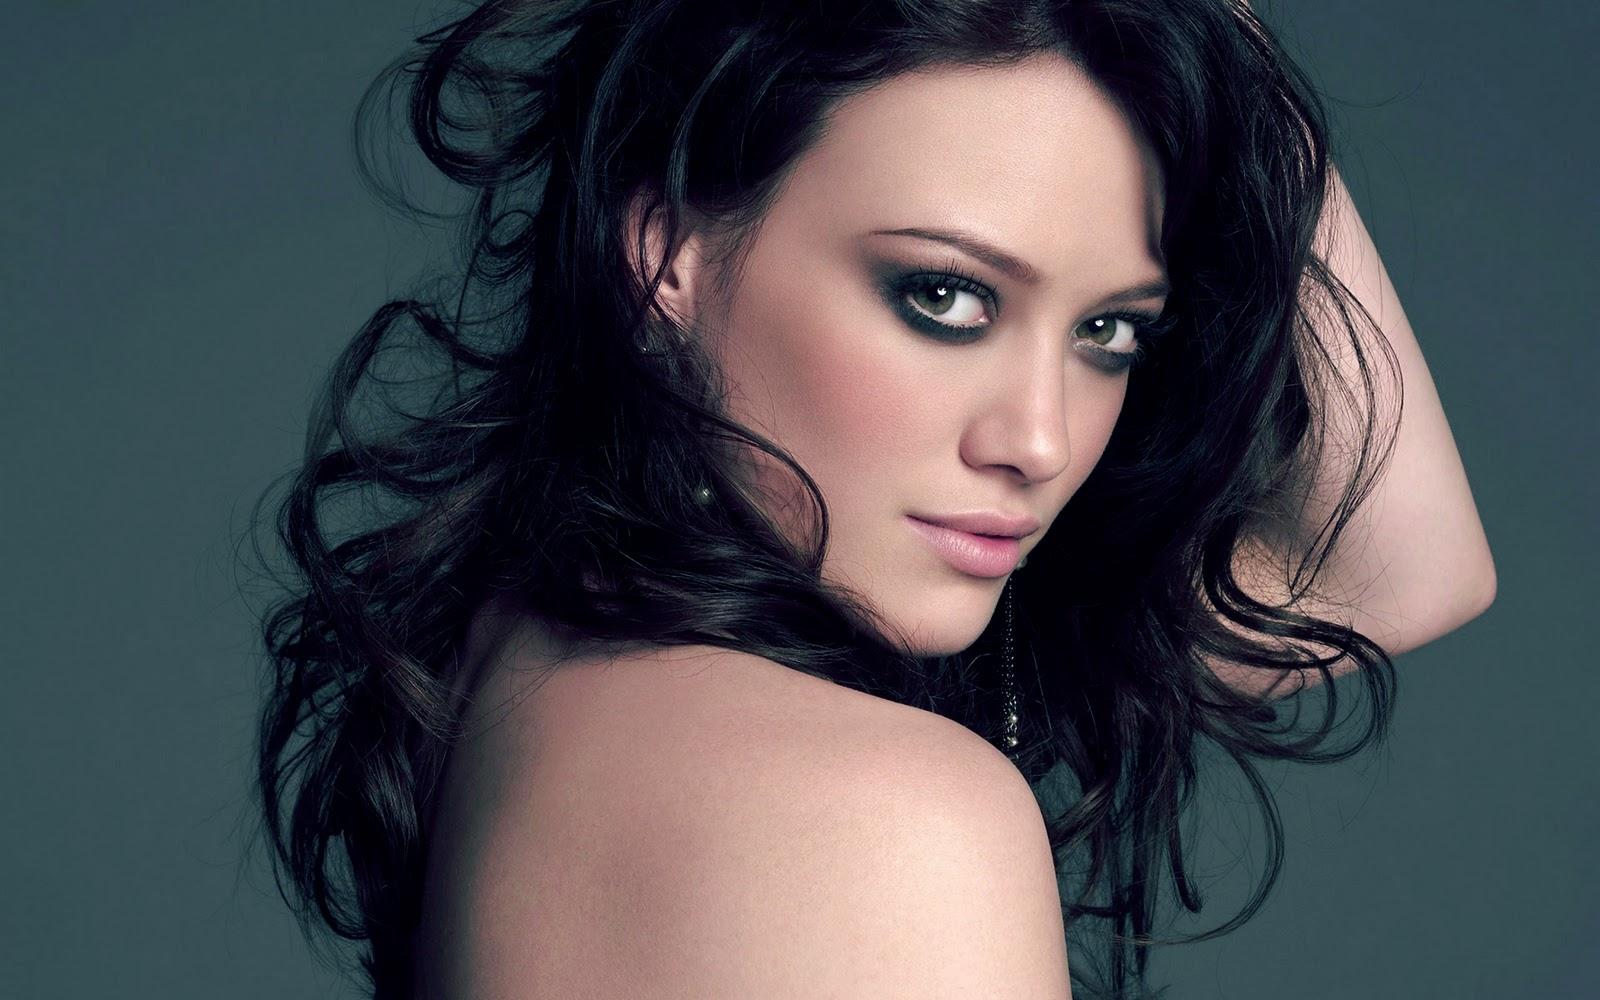 http://4.bp.blogspot.com/-uRkg2q9yzQA/TymCQDUlmHI/AAAAAAAAEO4/NLz3JT7KWbk/s1600/Hilary+Duff+Hairstyle.jpg